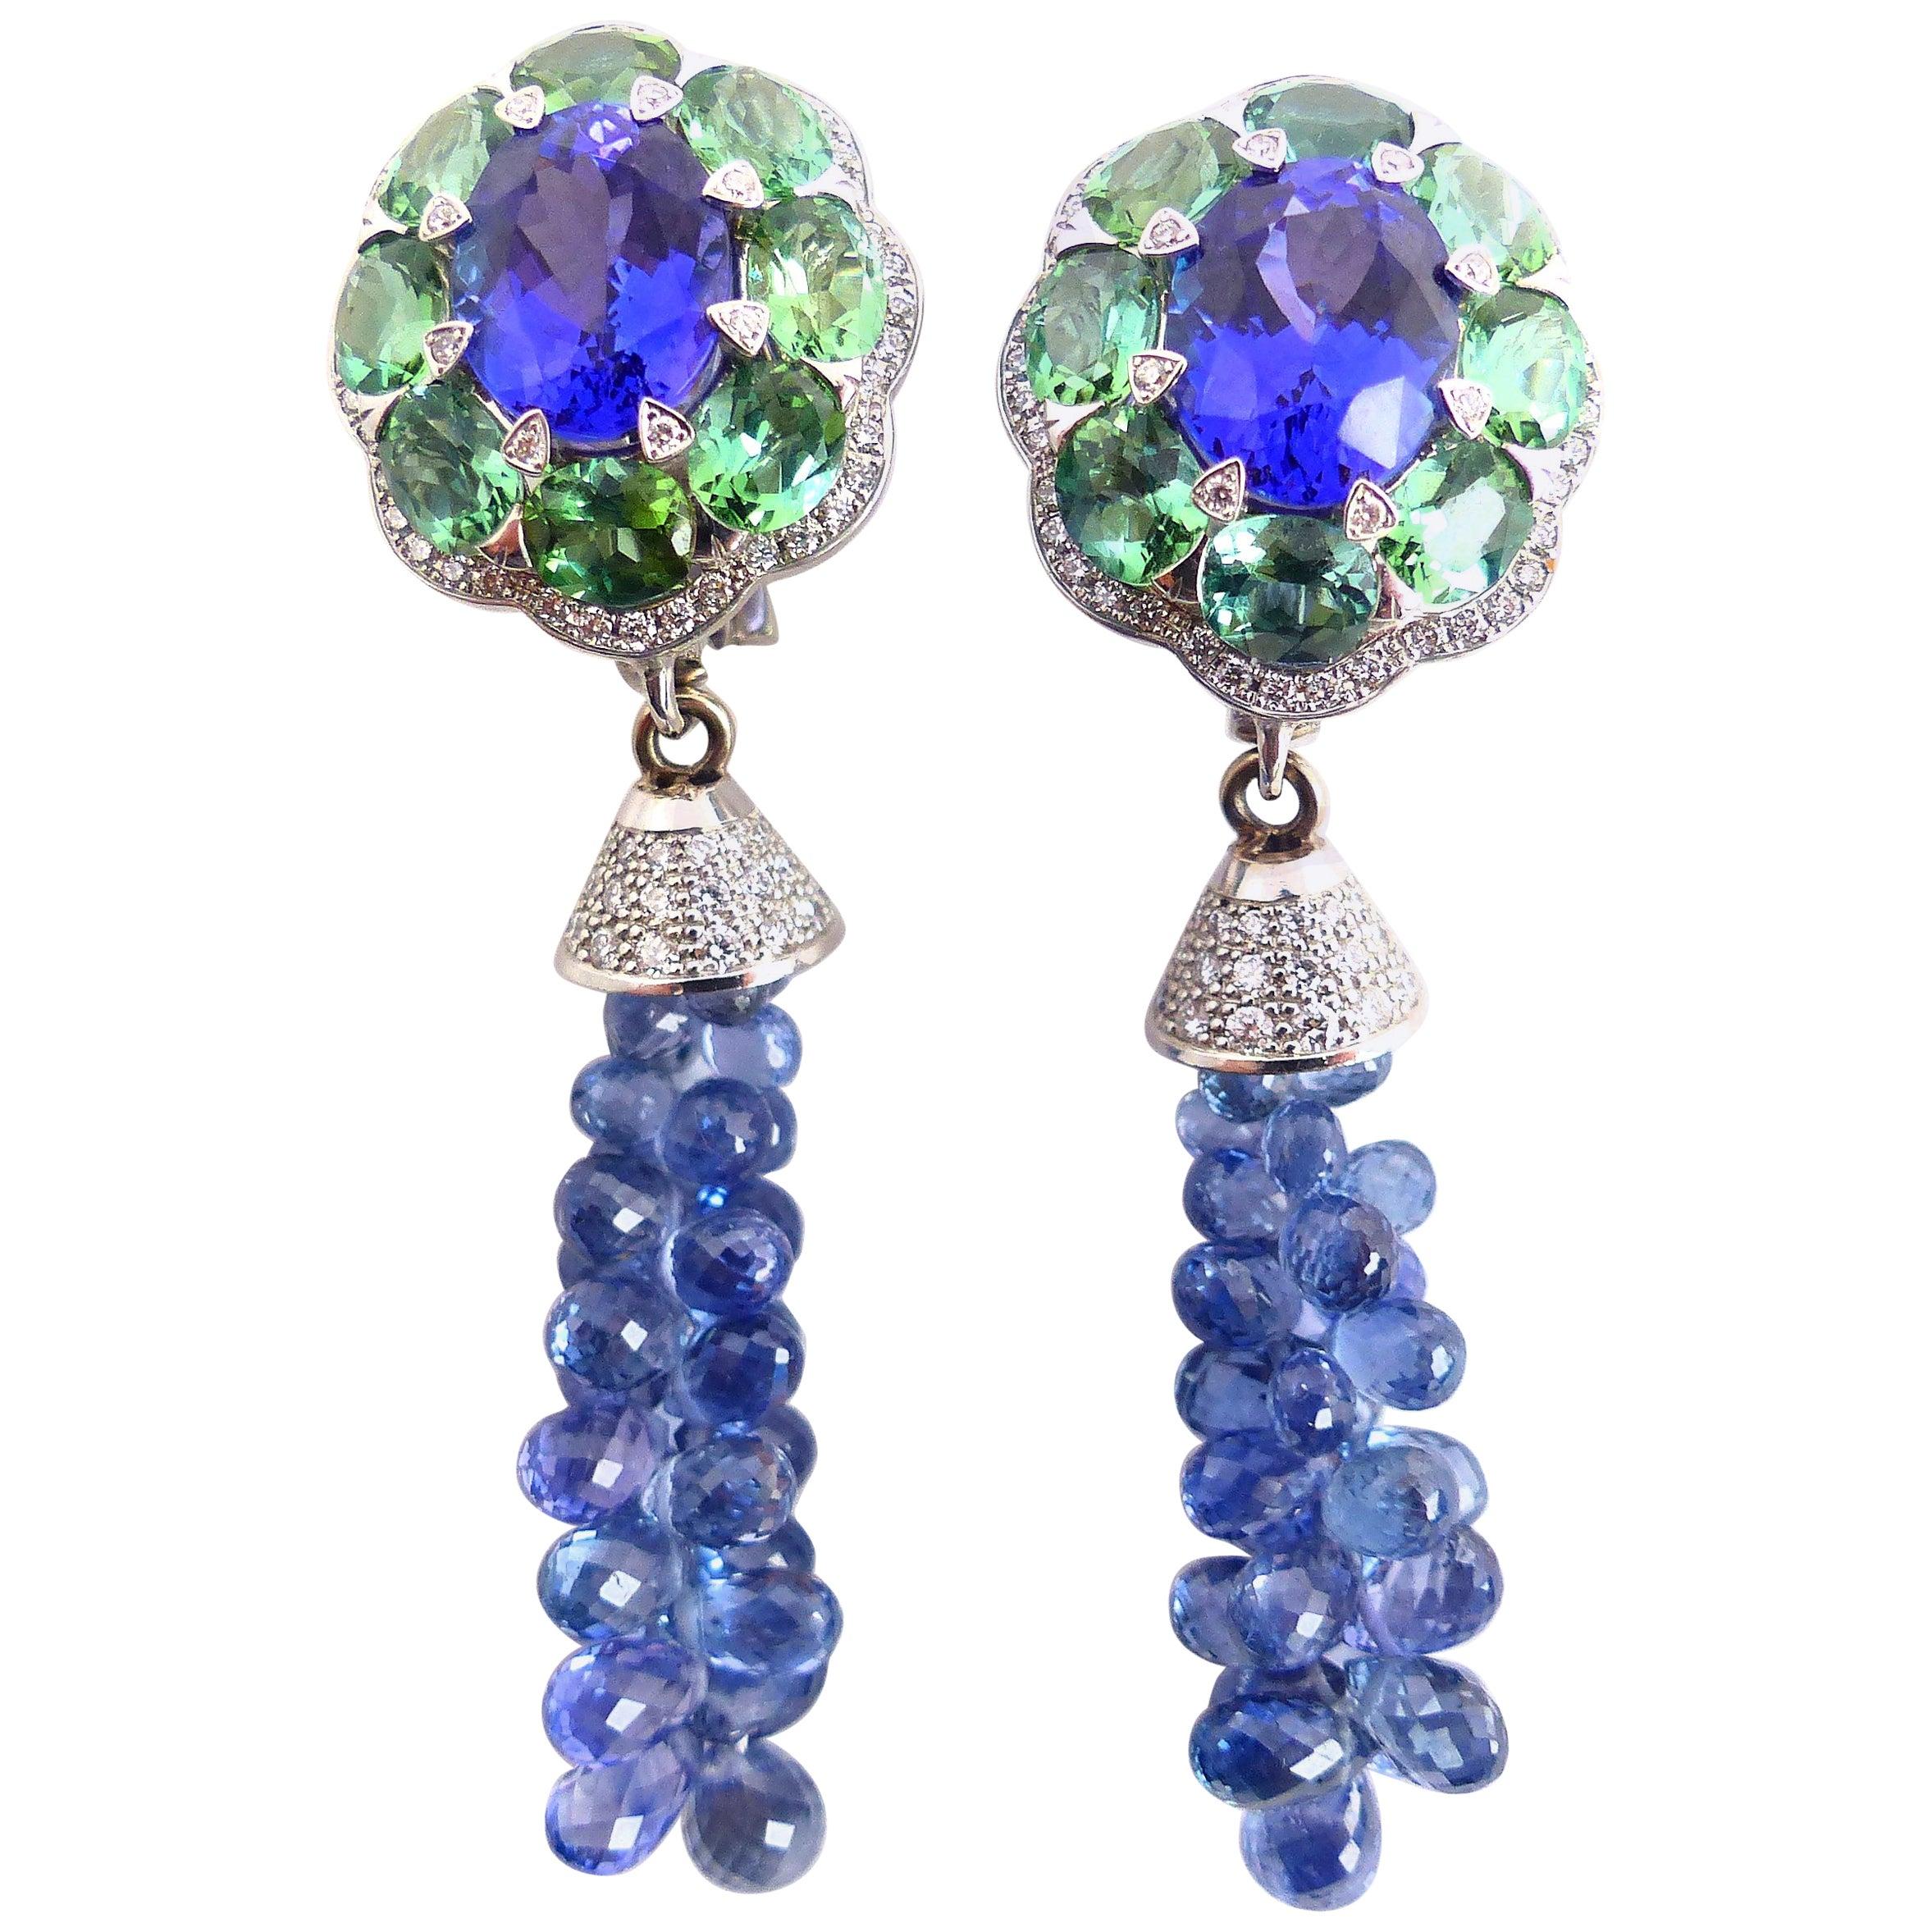 Leyser 18k White Gold Tanzanites, Tourmalines, Sapphires & Diamonds Earrings